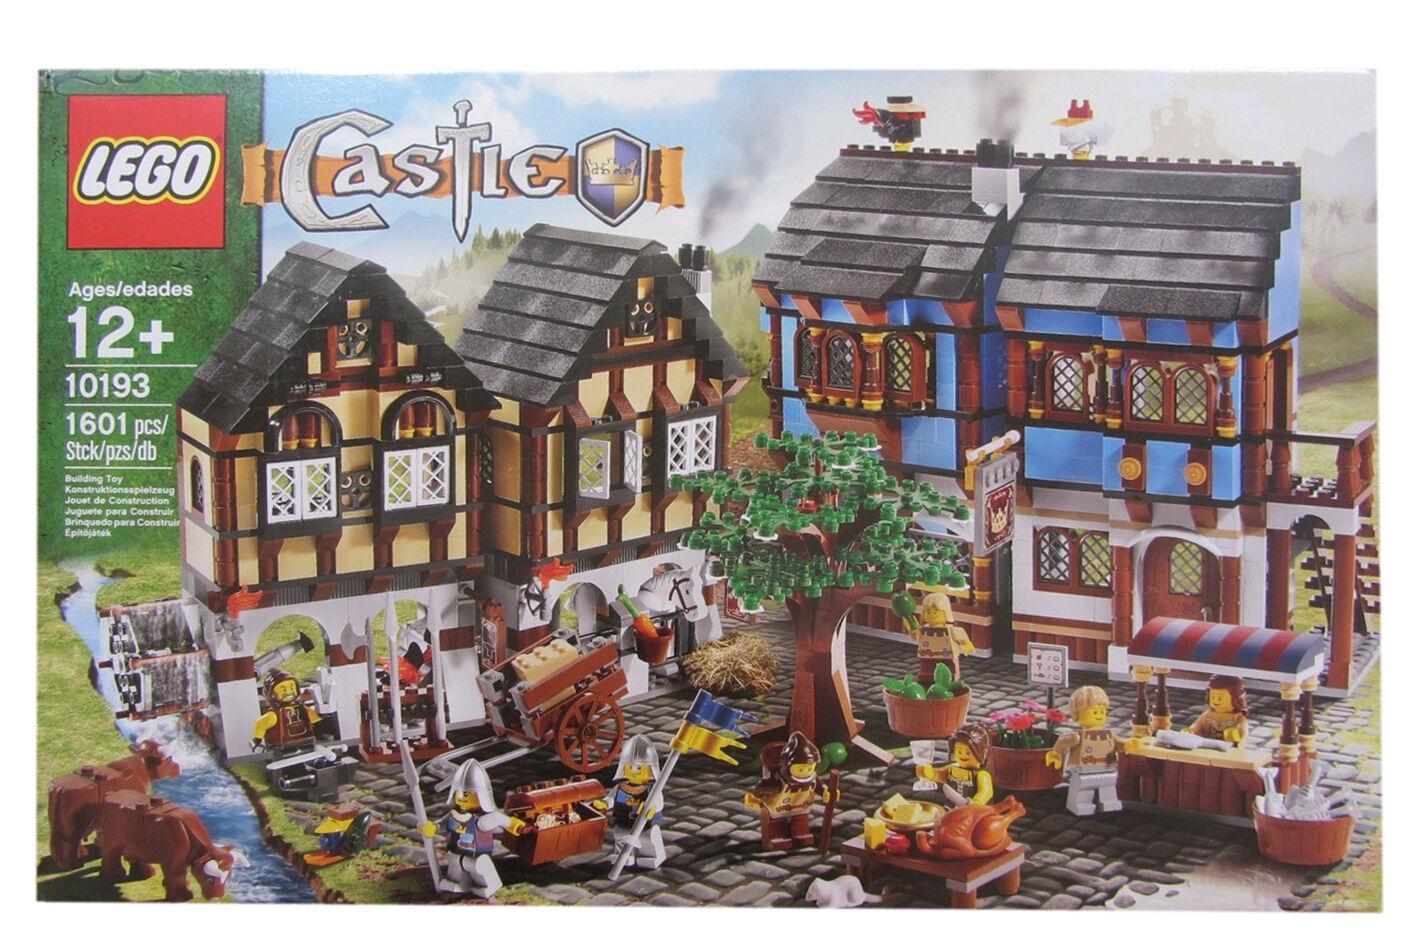 LEGO Castle Mittelalterlicher Marktplatz 10193 Neu Neu Neu & OVP cbf891